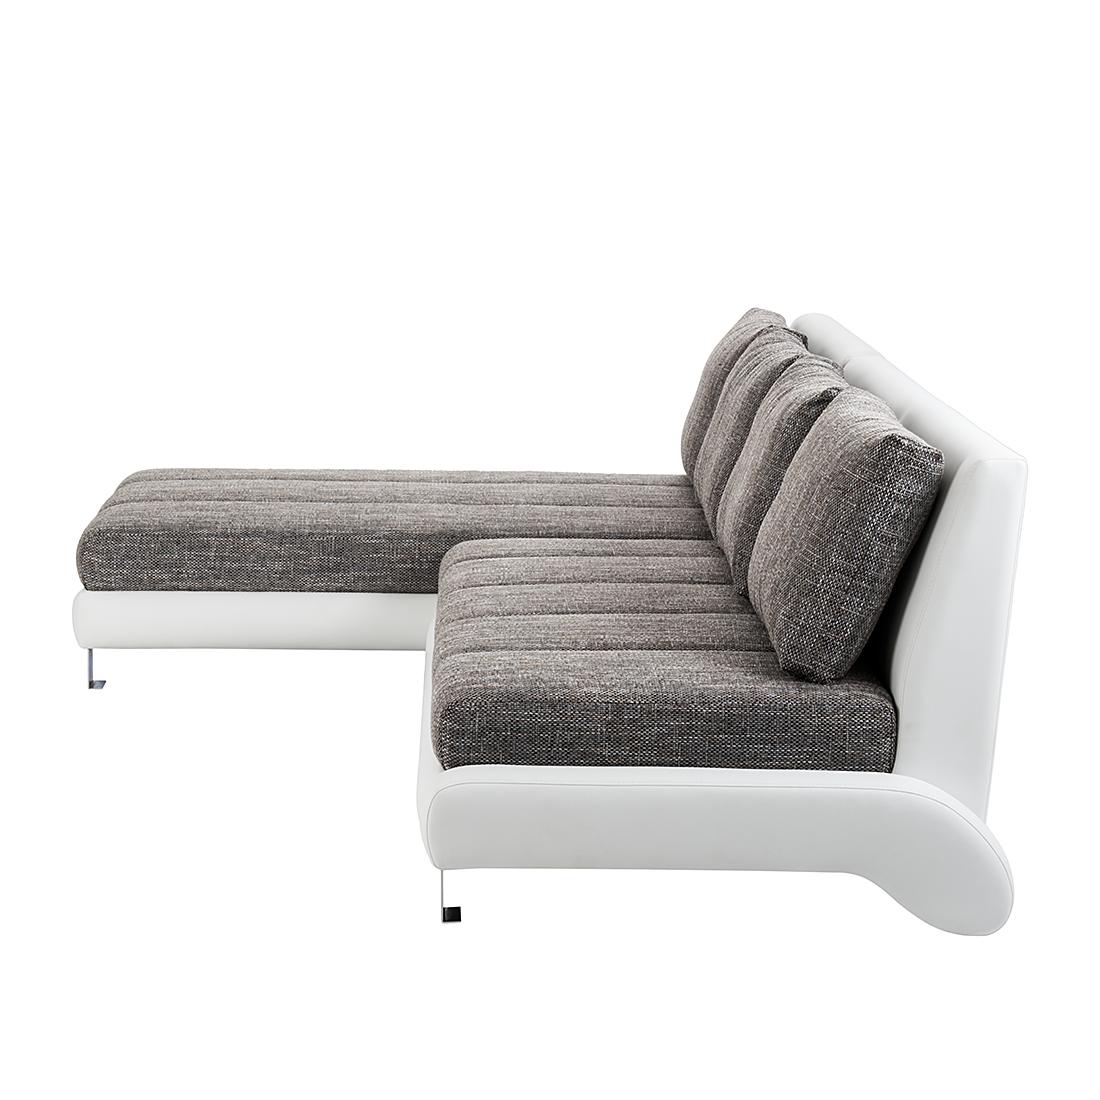 ecksofa stoff grau wei beige 3 sitzer sofa couch eckcouch polsterecke neu ebay. Black Bedroom Furniture Sets. Home Design Ideas